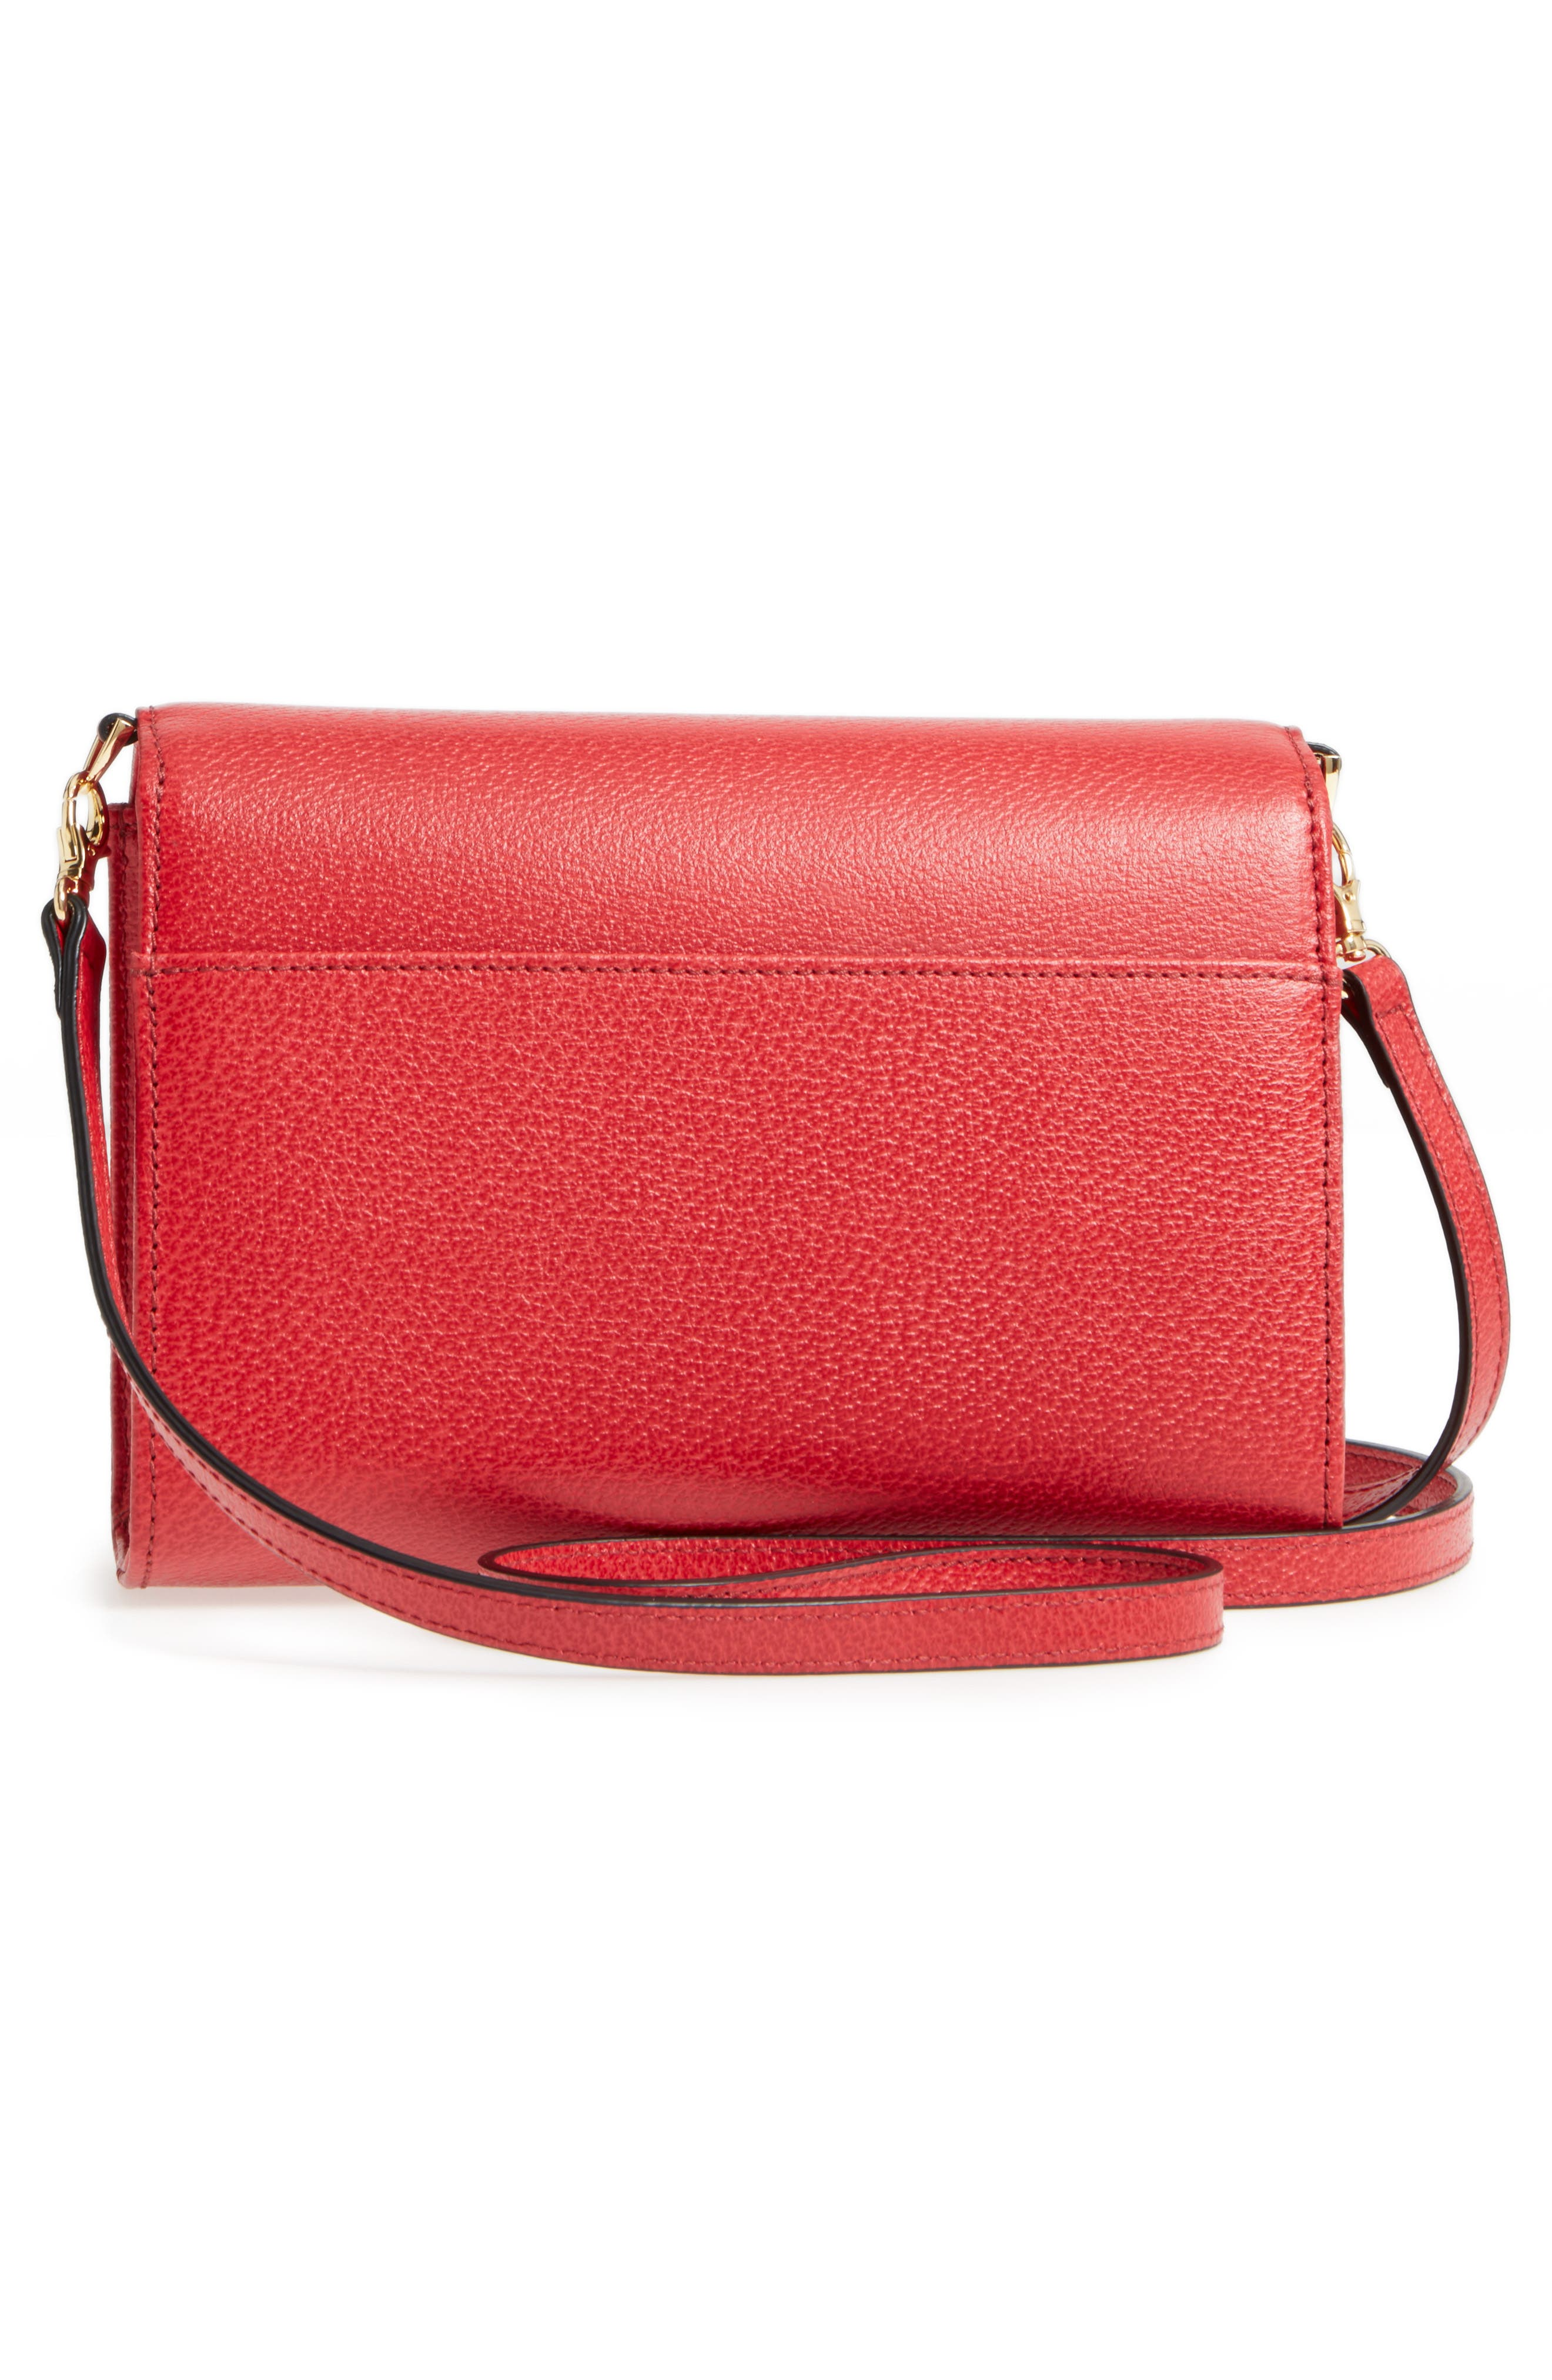 LODIS Stephanie Under Lock & Key - Small Eden Leather Crossbody Bag,                             Alternate thumbnail 3, color,                             600